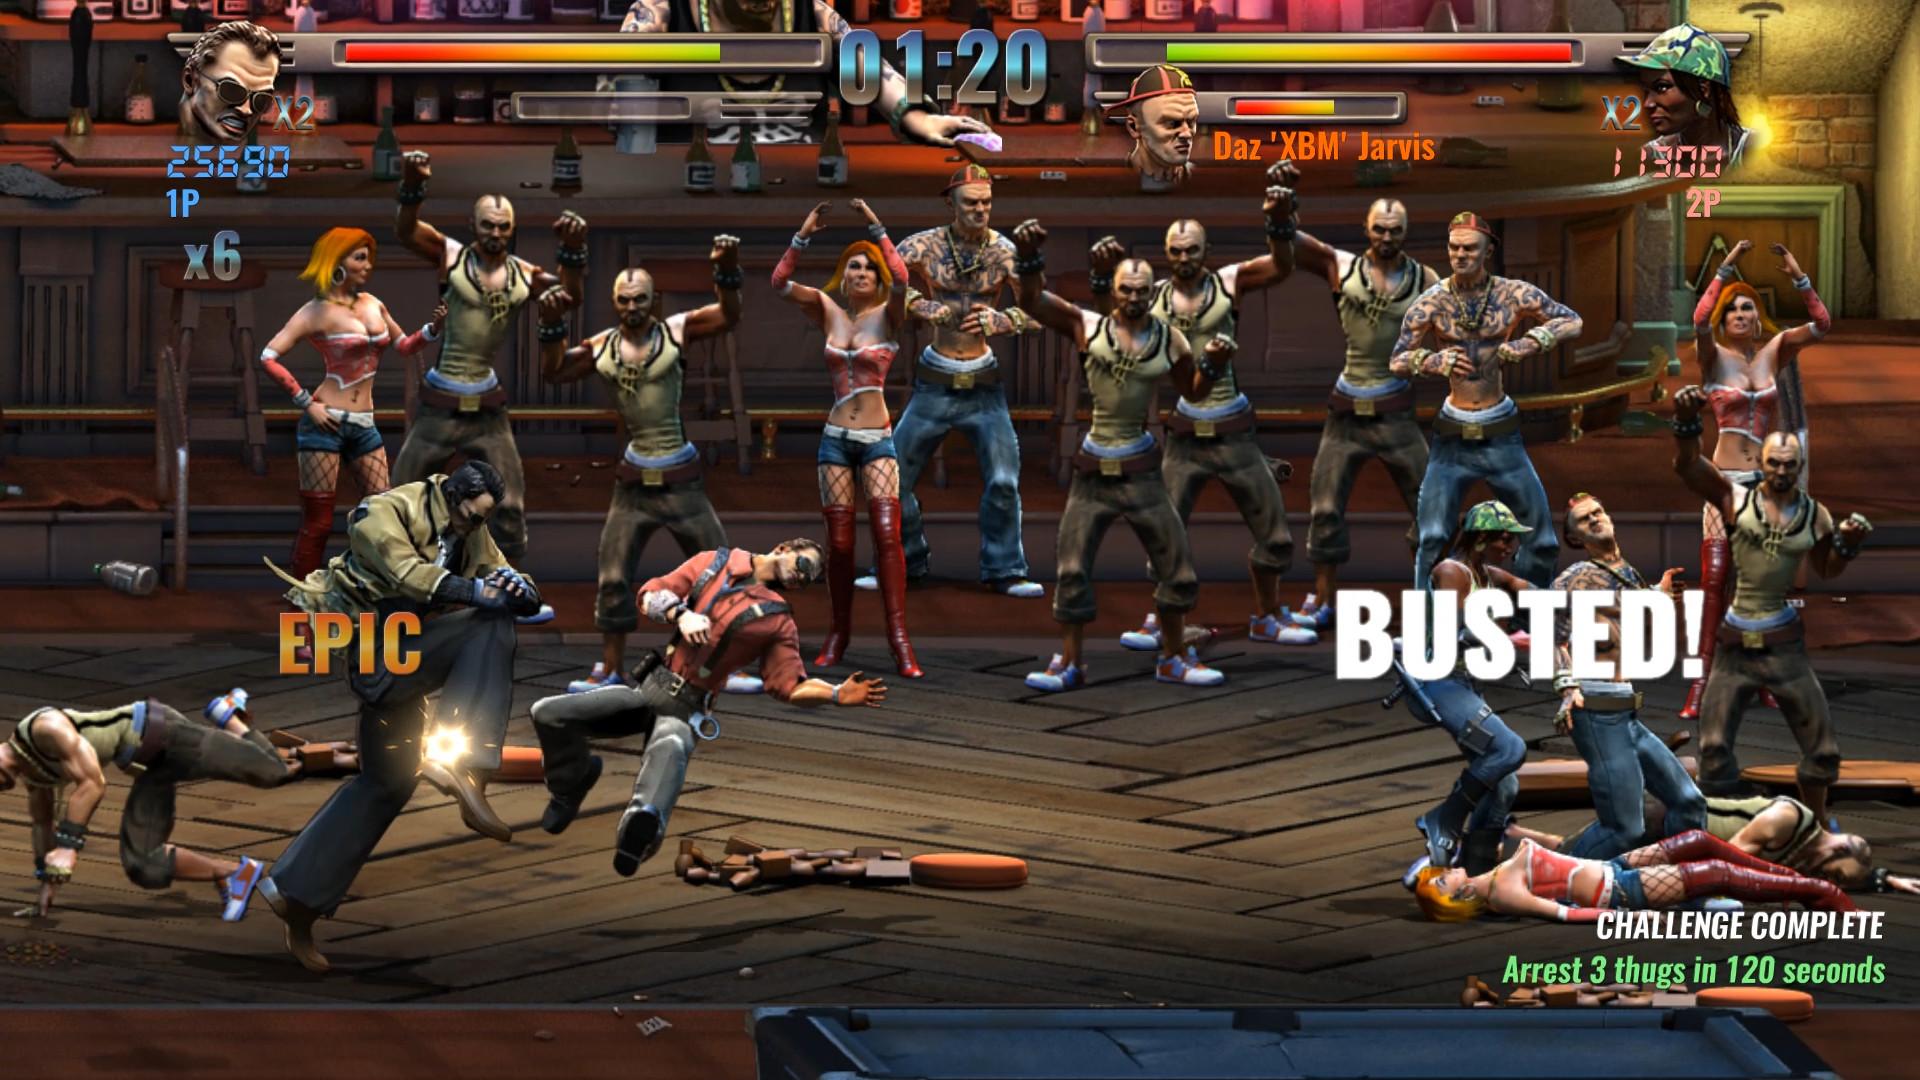 raging_justice-2.jpg - -